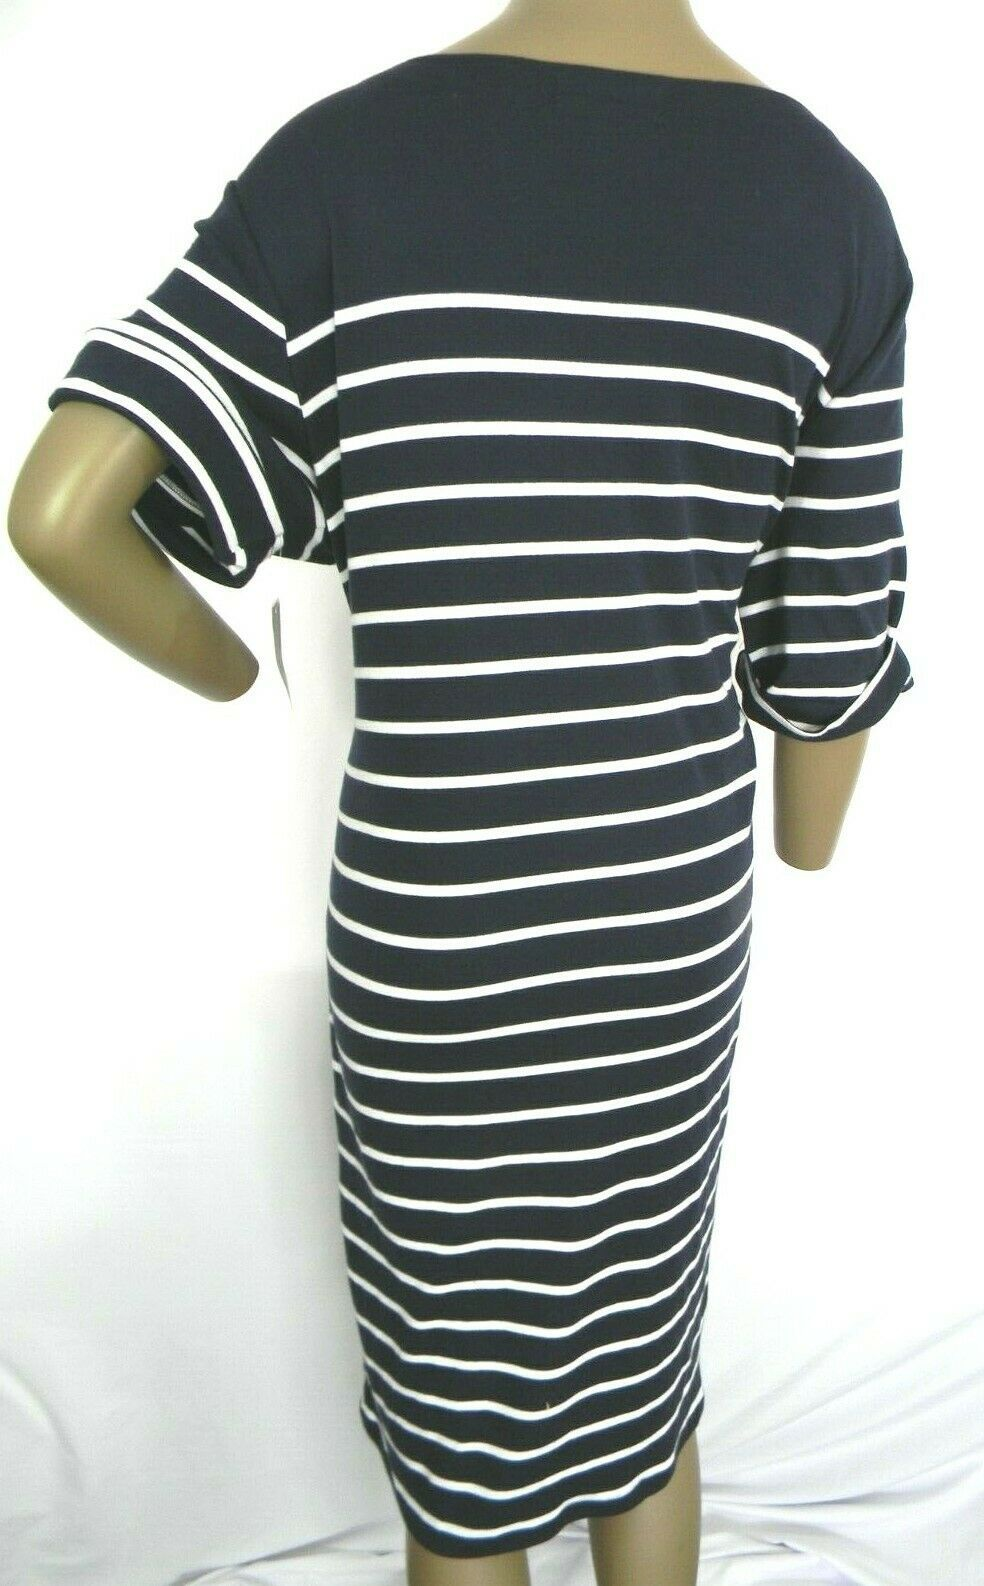 Karen Scott Plus Size 2X,3X Dress Floral Embroidered Striped Shift Dress NEW $54 image 5